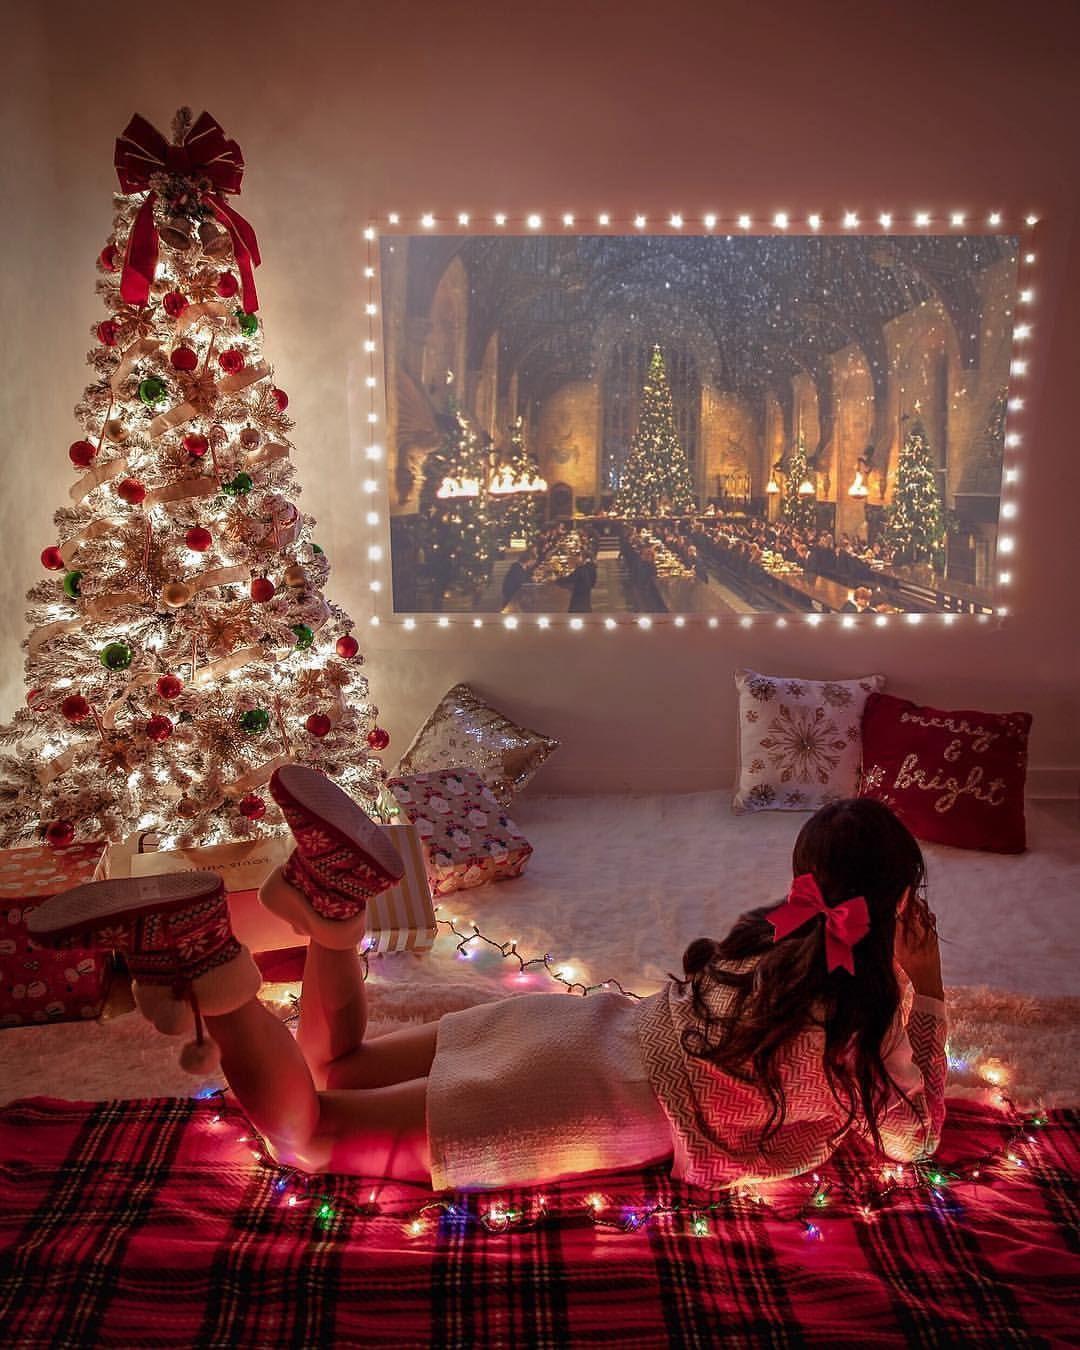 Cozy Vibes Yay Like If You Like Harry Potter Movies Credi Christmas Aesthetic Christmas Tree Decorations Cozy Christmas The history of christmas cards. christmas tree decorations